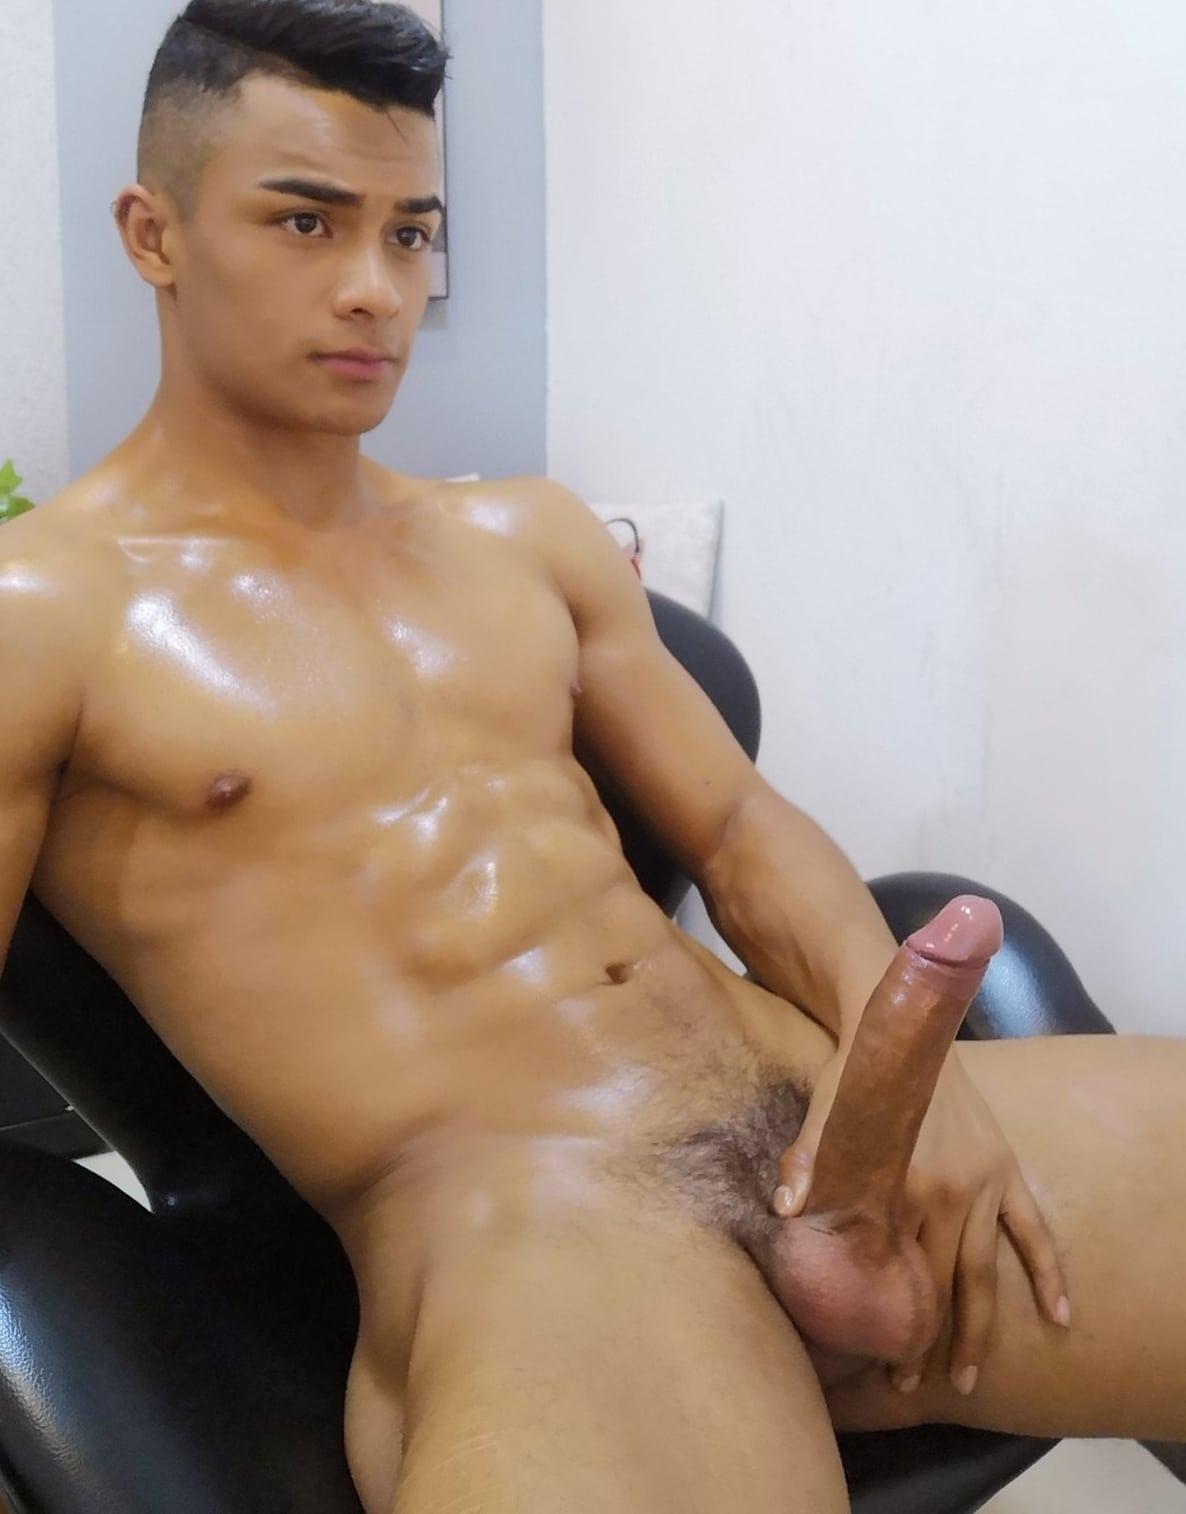 Sexy nude Latino muscle boy